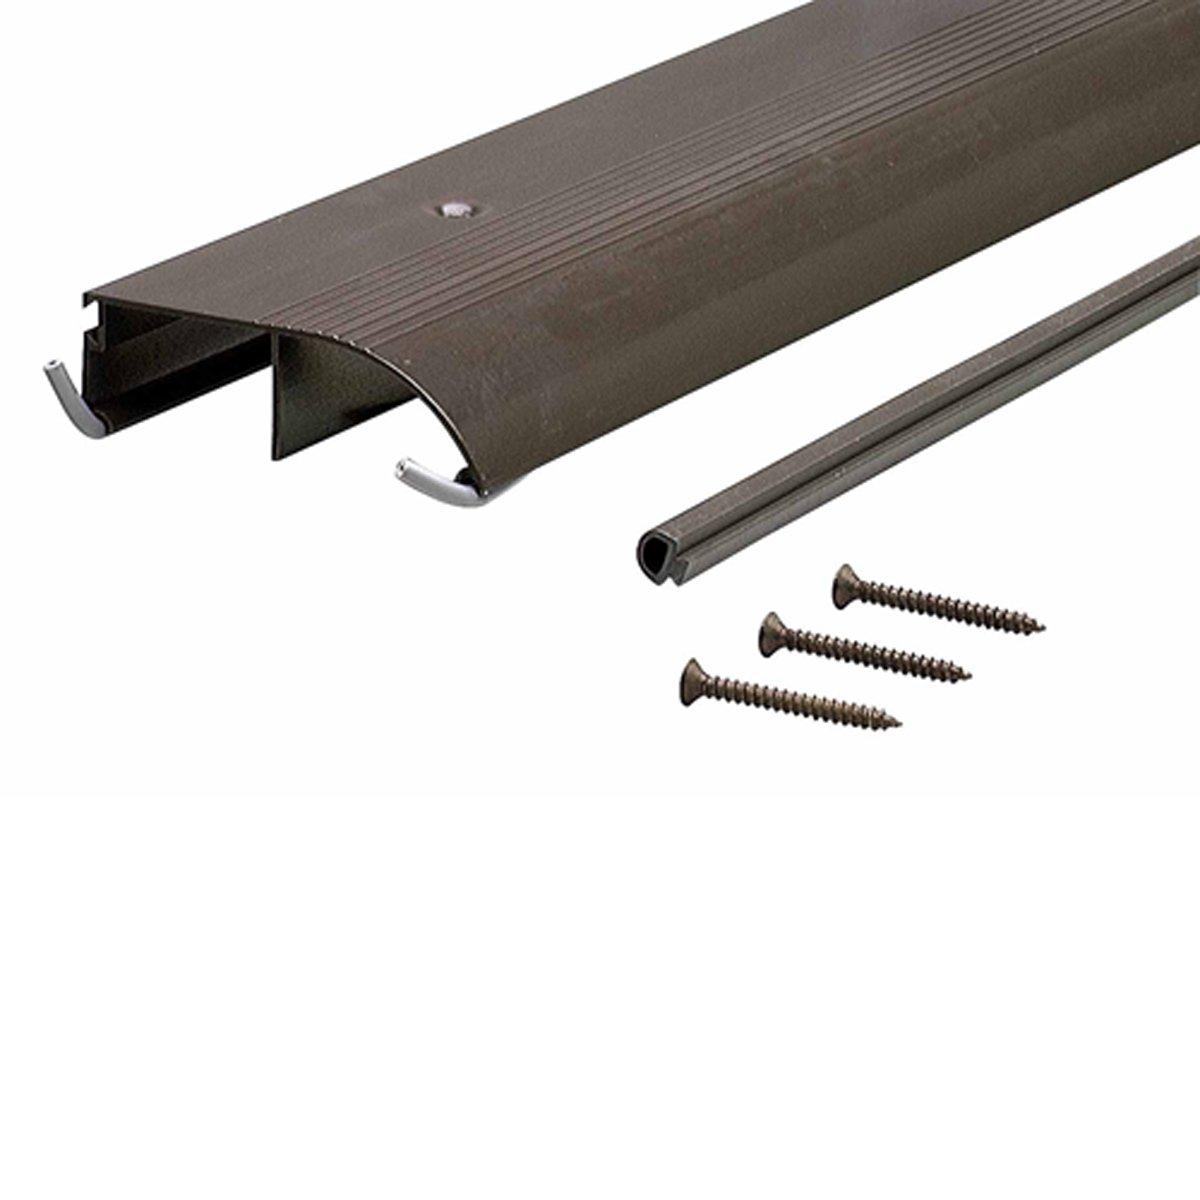 M-D Building Products 69703 TH153 Bumper Threshold, 1″ x 3-1/4″ x 36″, Bronze